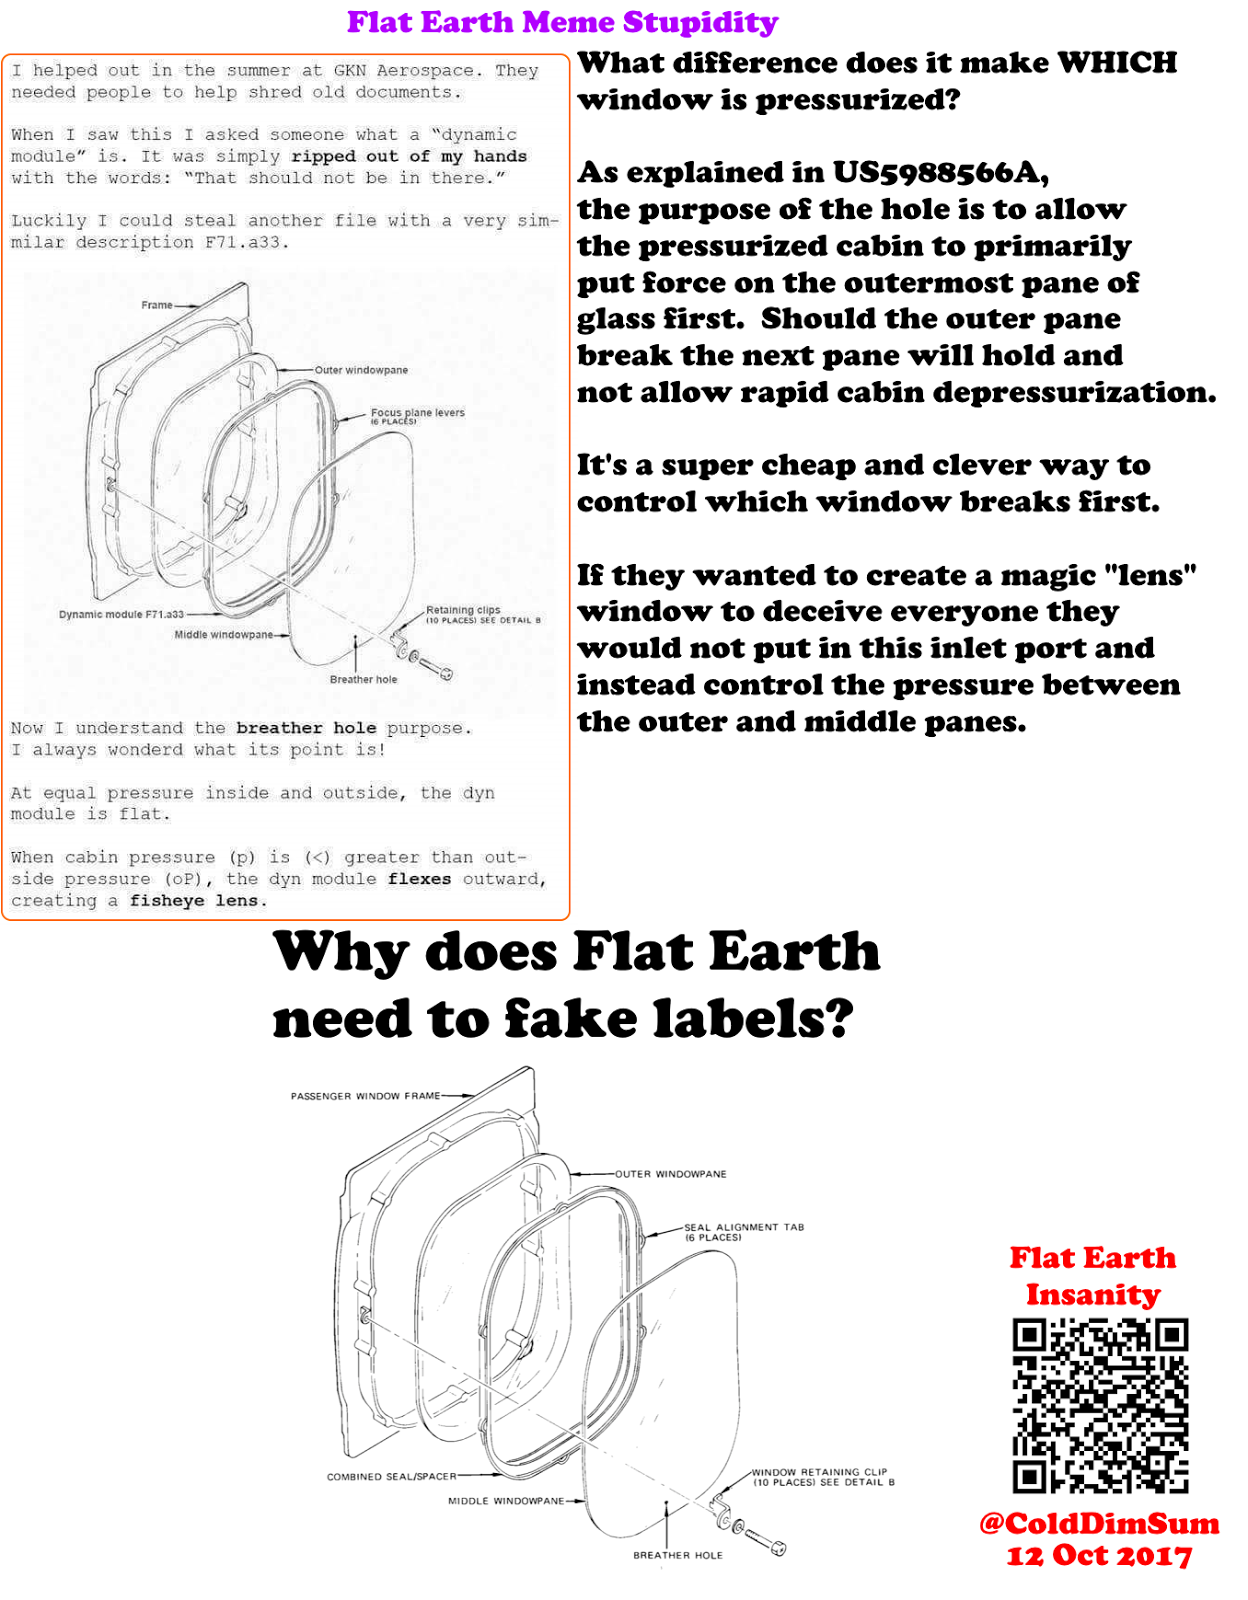 Flat Earth Insanity Flat Earth Follies Magic Fish Eye